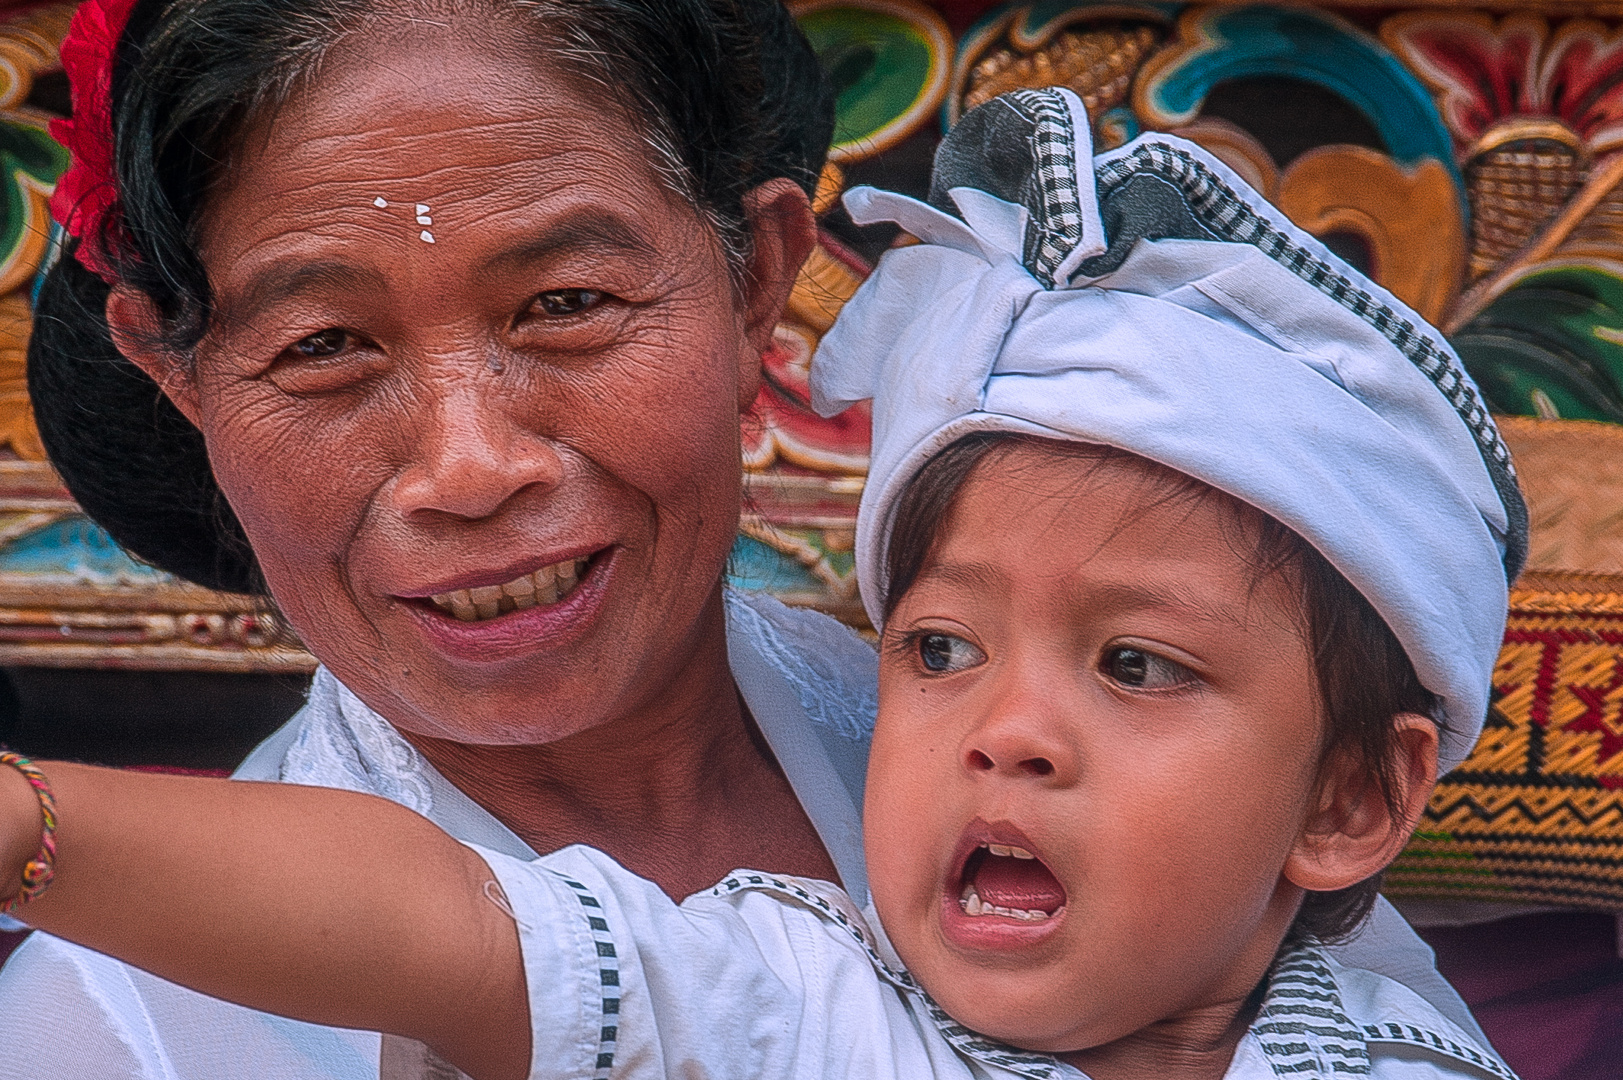 Grandma and her grandson